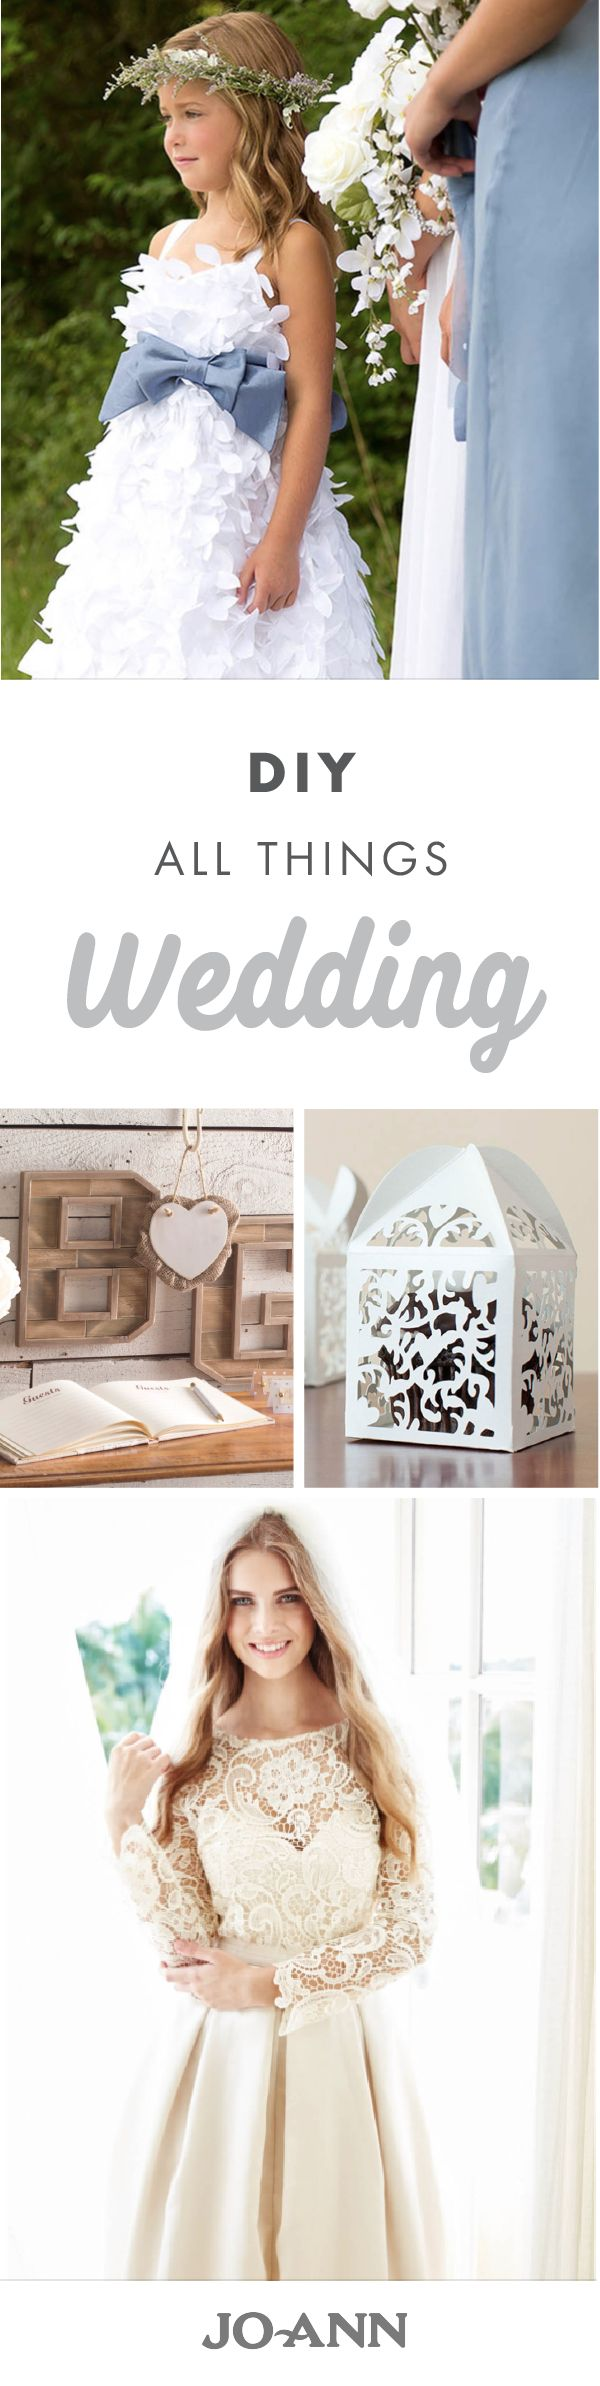 449 best wedding planning with joann images on pinterest wedding